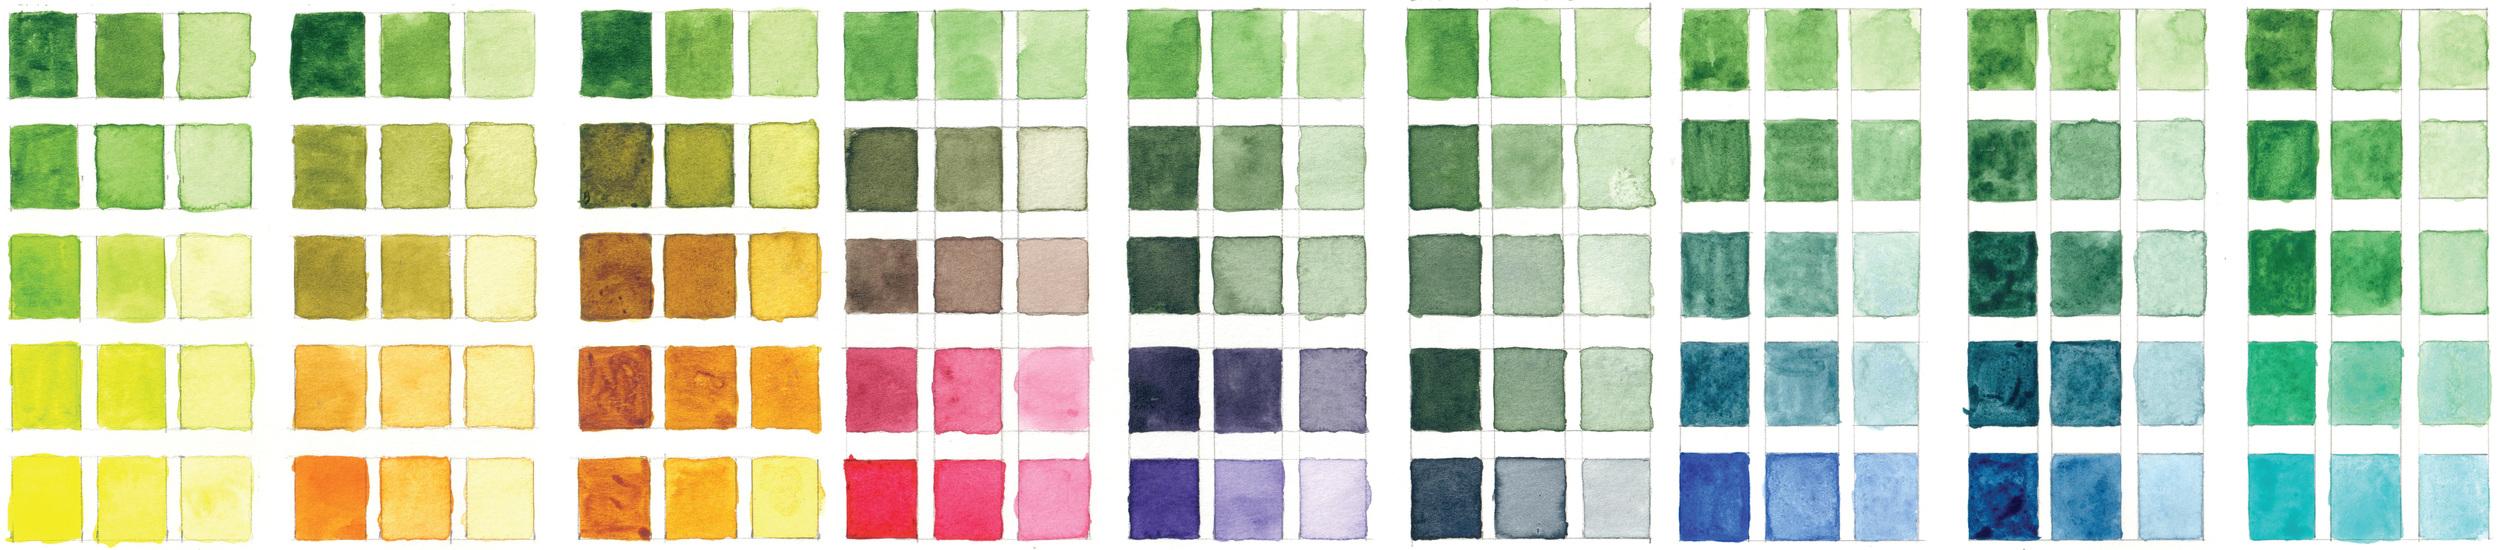 Sap Green Color Studies | VanillaArts.com